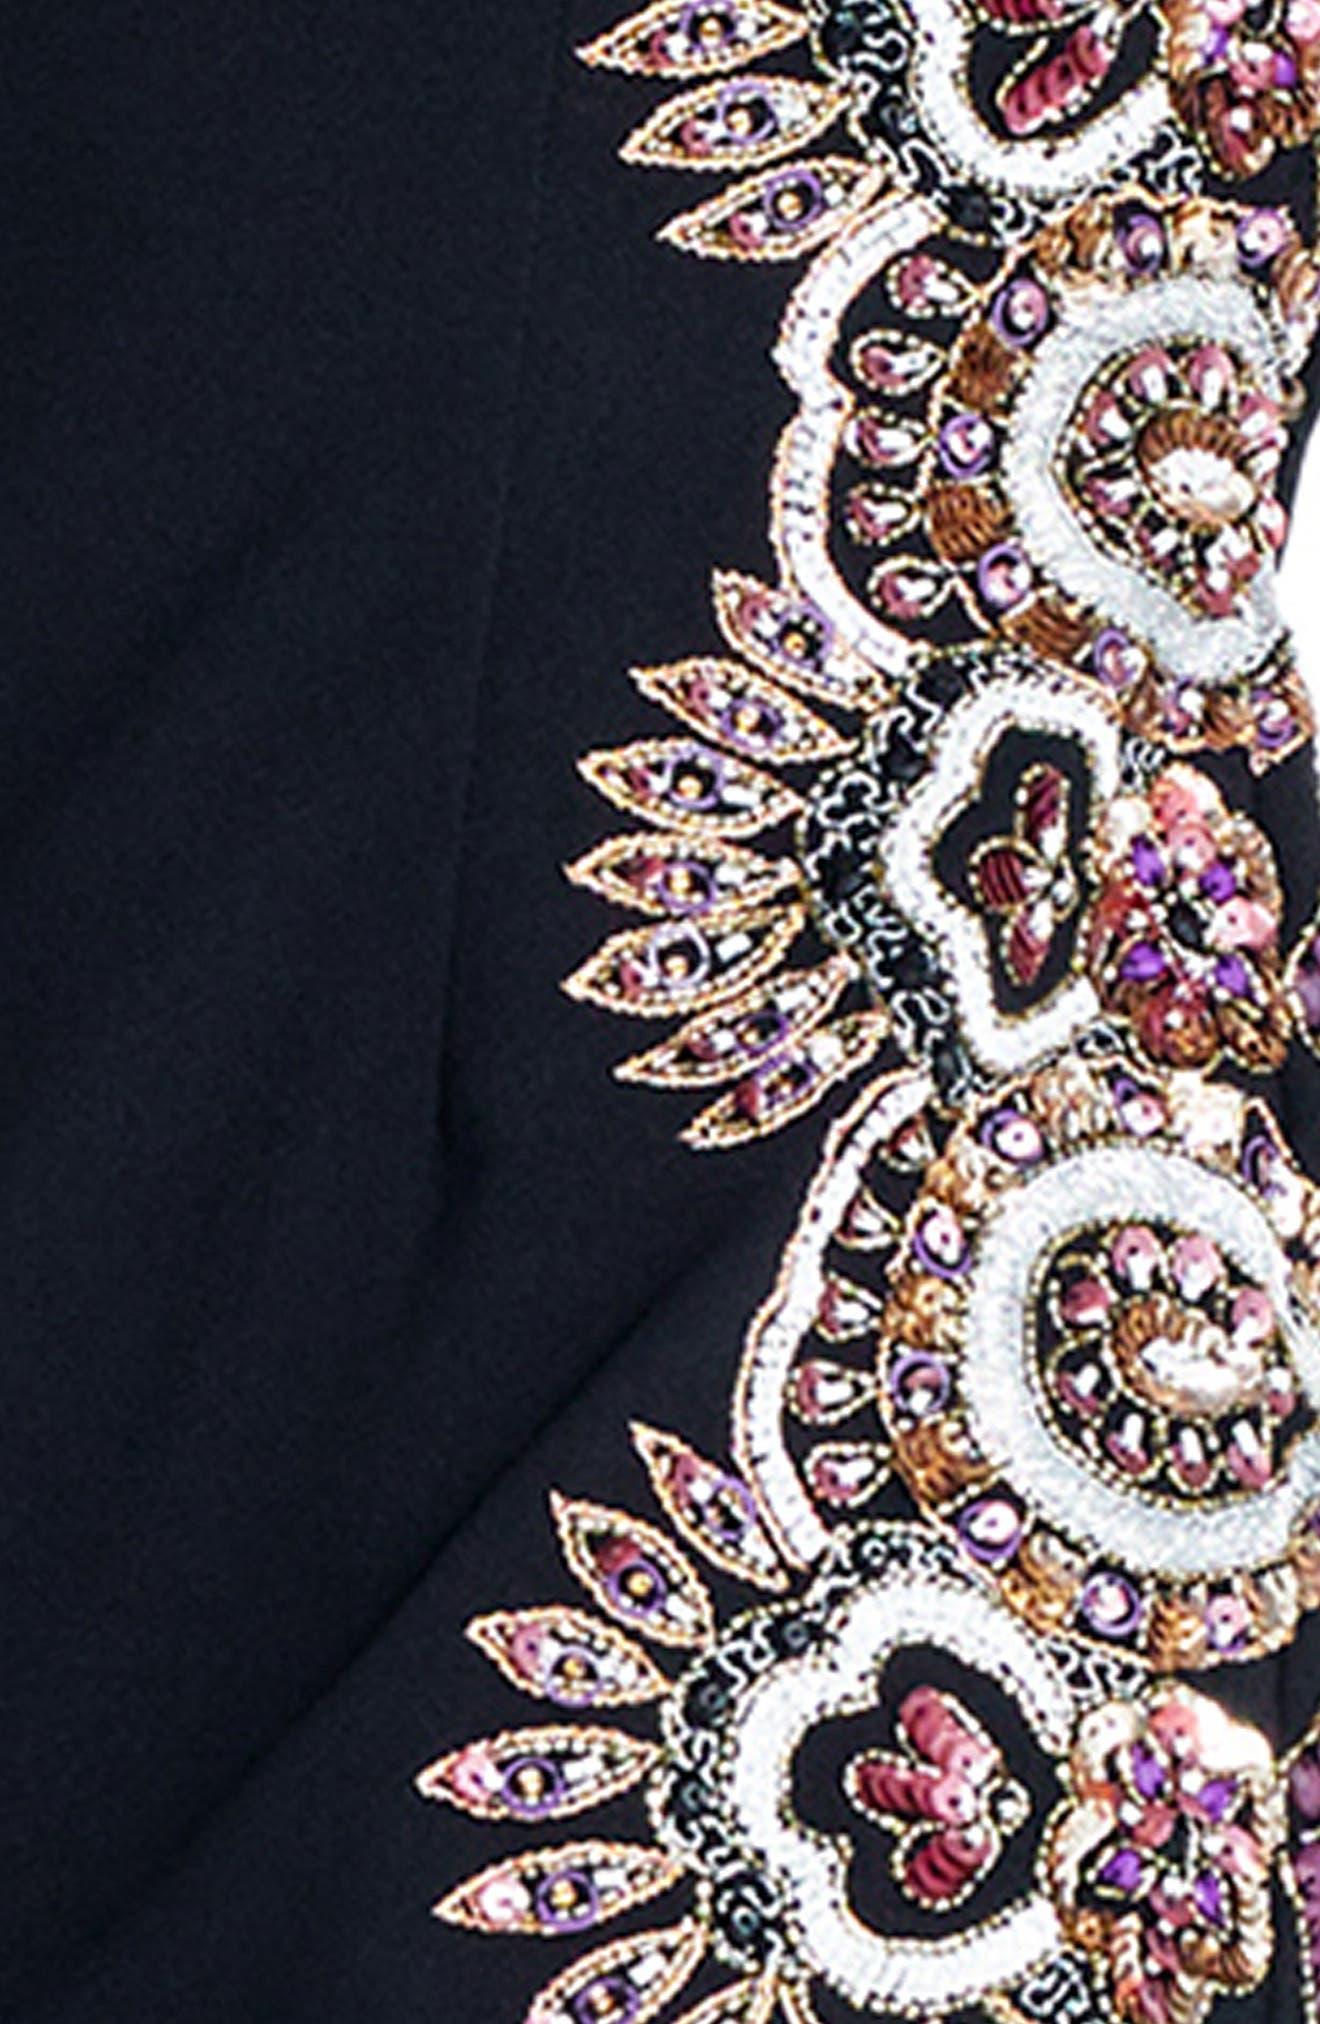 Beaded Crepe Sheath Dress,                             Alternate thumbnail 4, color,                             Black